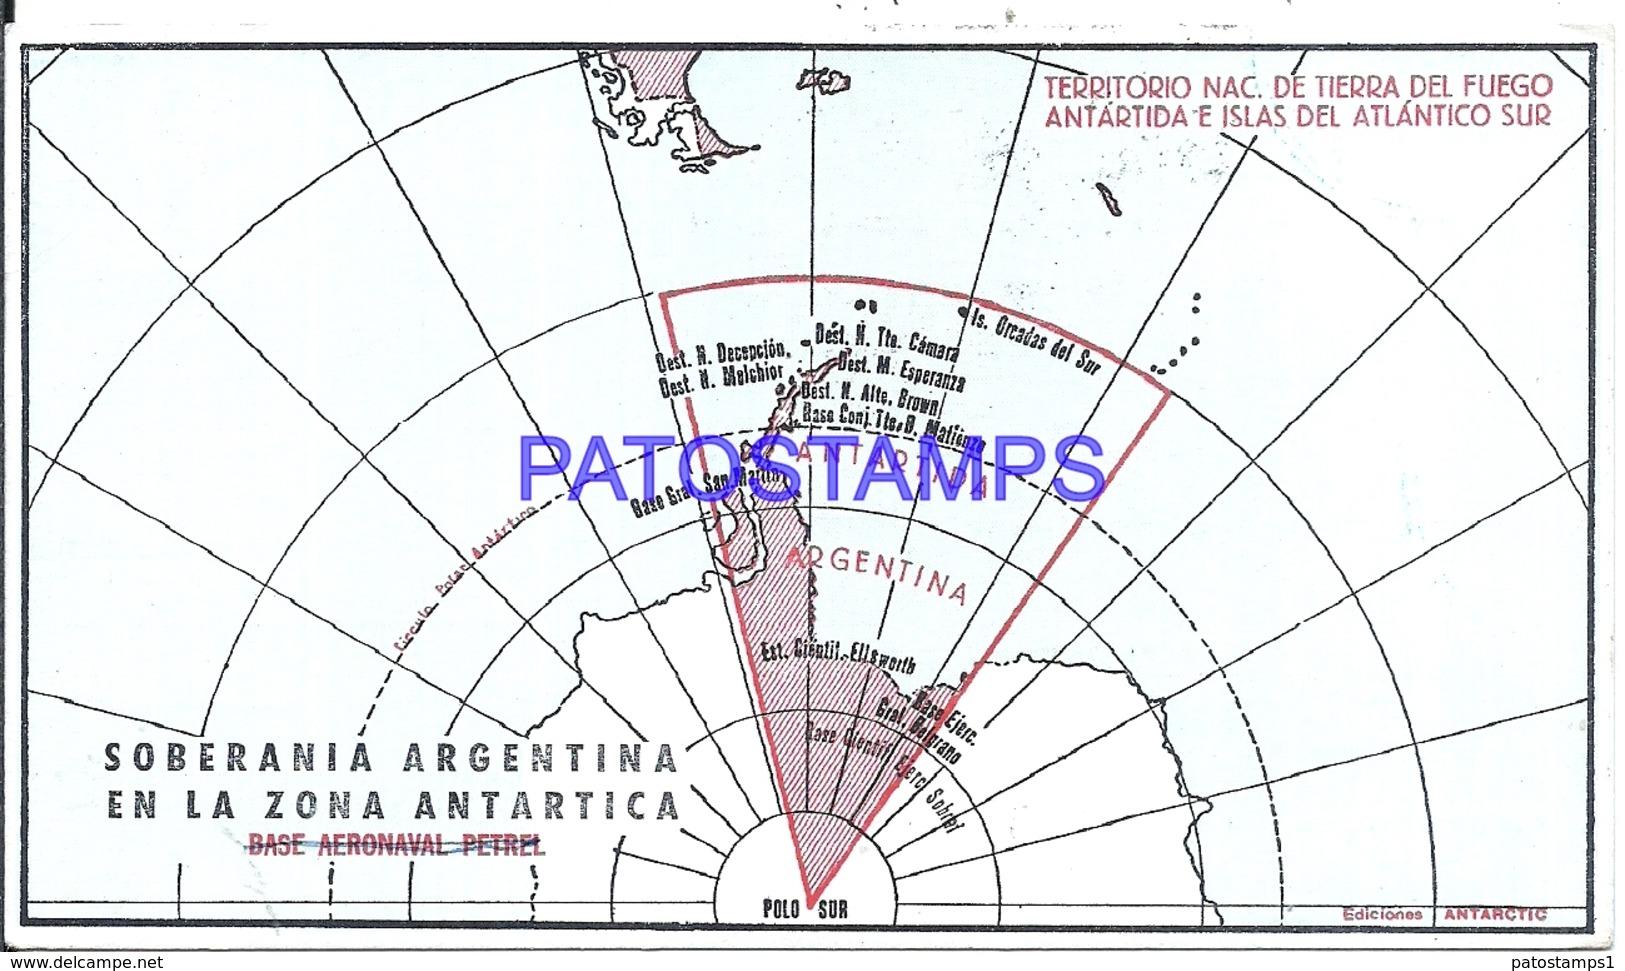 117458 ARGENTINA ANTARTIDA ANTARCTICA MAP CRUCERO LIBERTAD 1972 CIRCULATED TO BUENOS AIRES POSTCARD - Argentinien